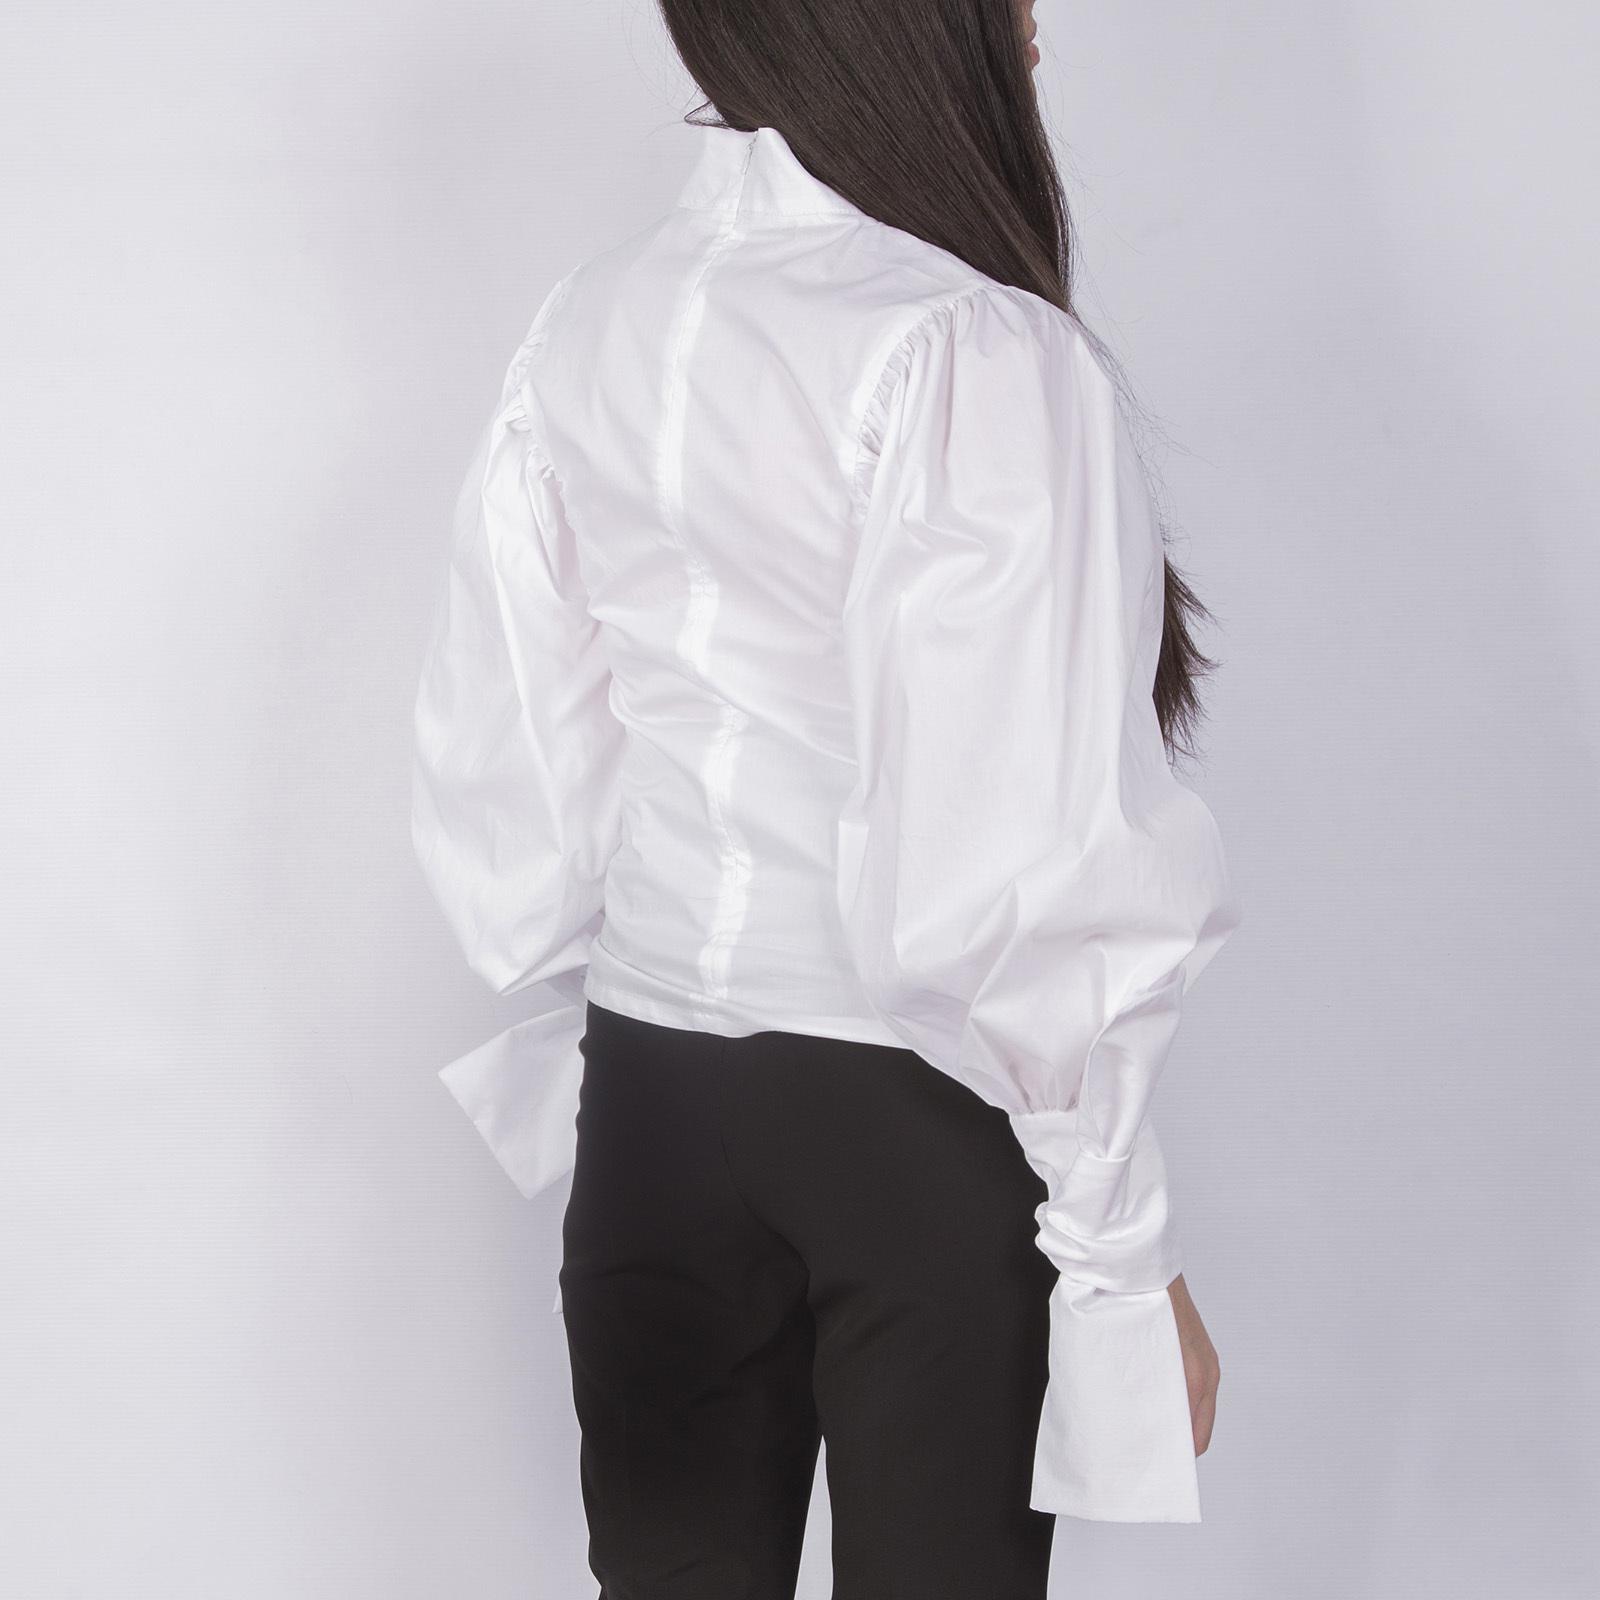 Рубашка, Ballerina, Dynasty (белый)